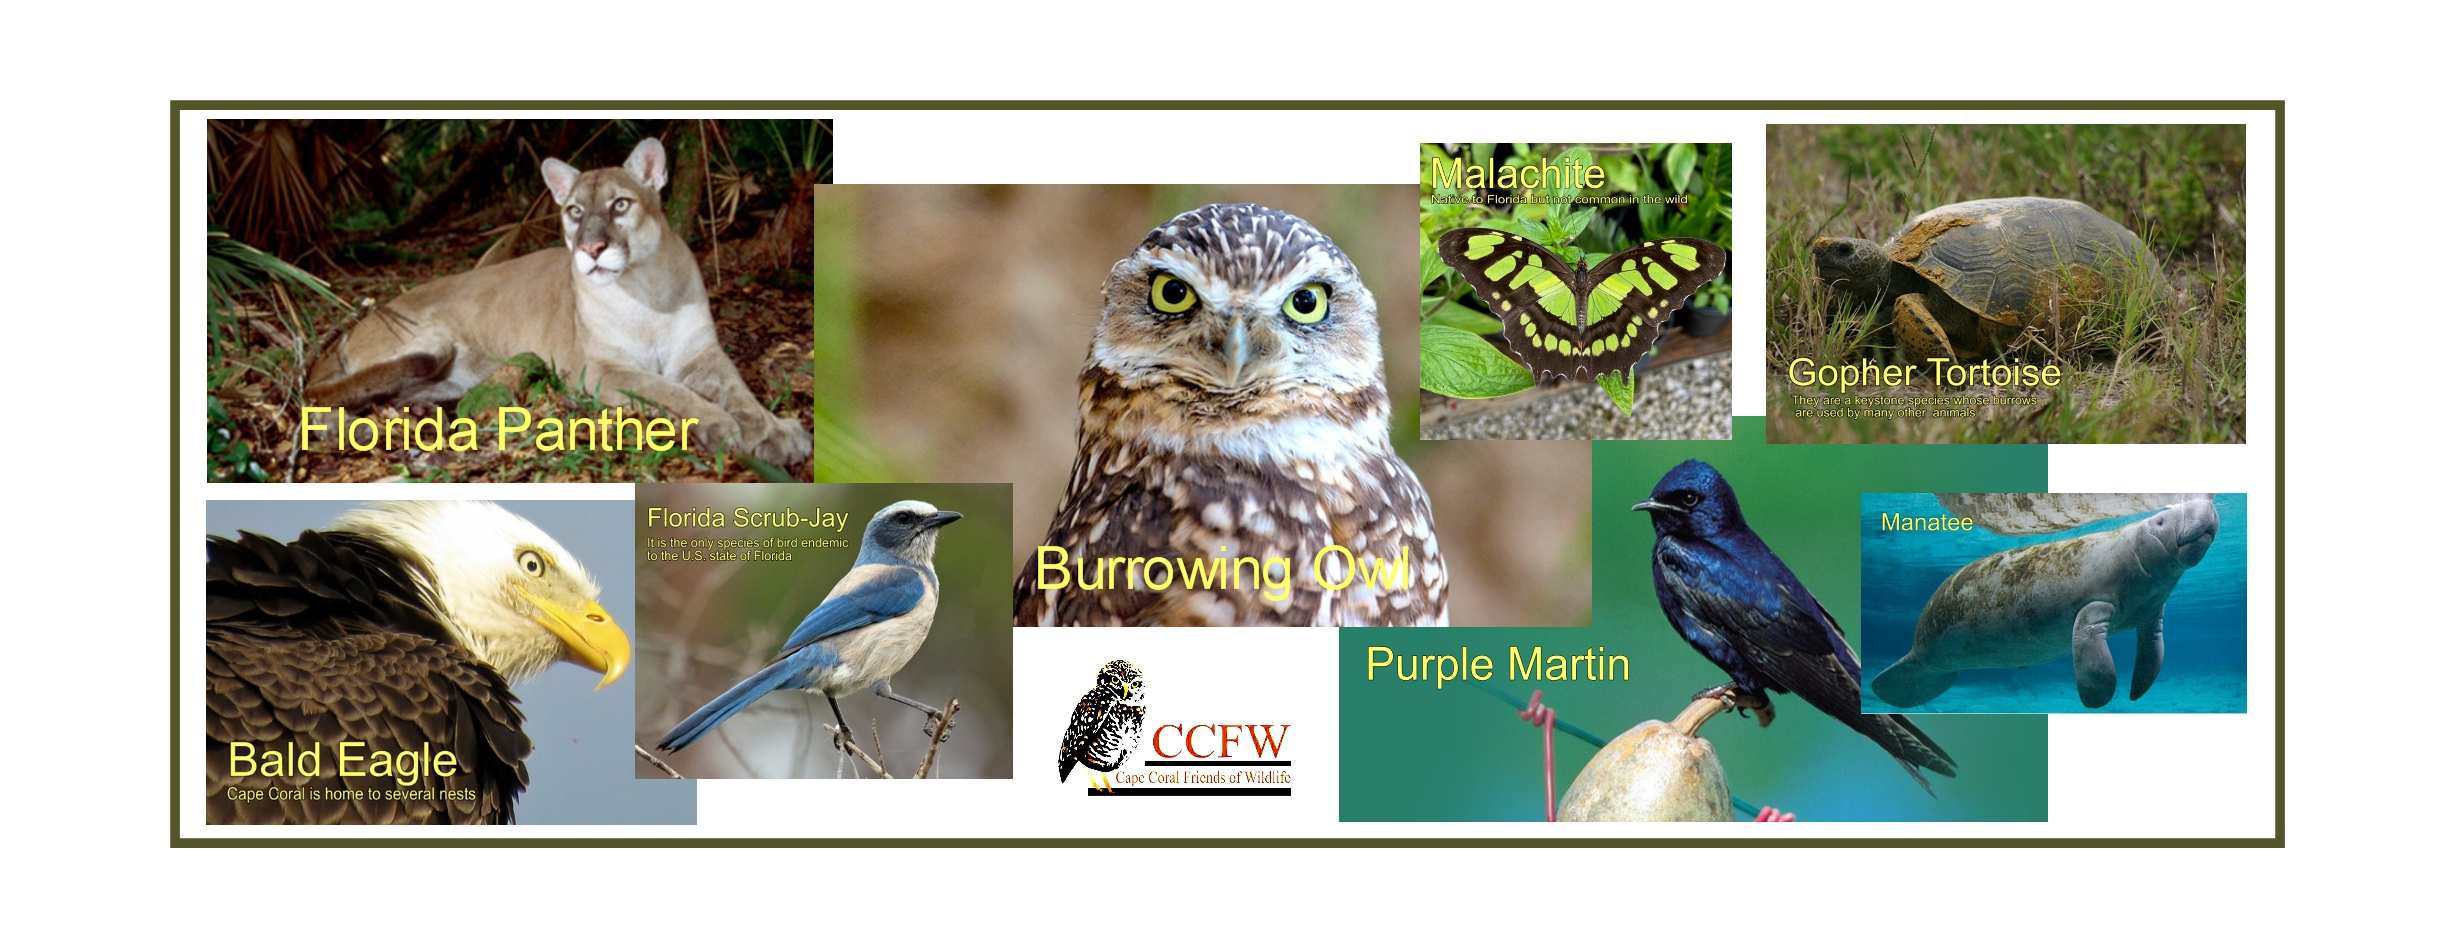 Burrowing Owl Festival Wildlife and Environmental Expo